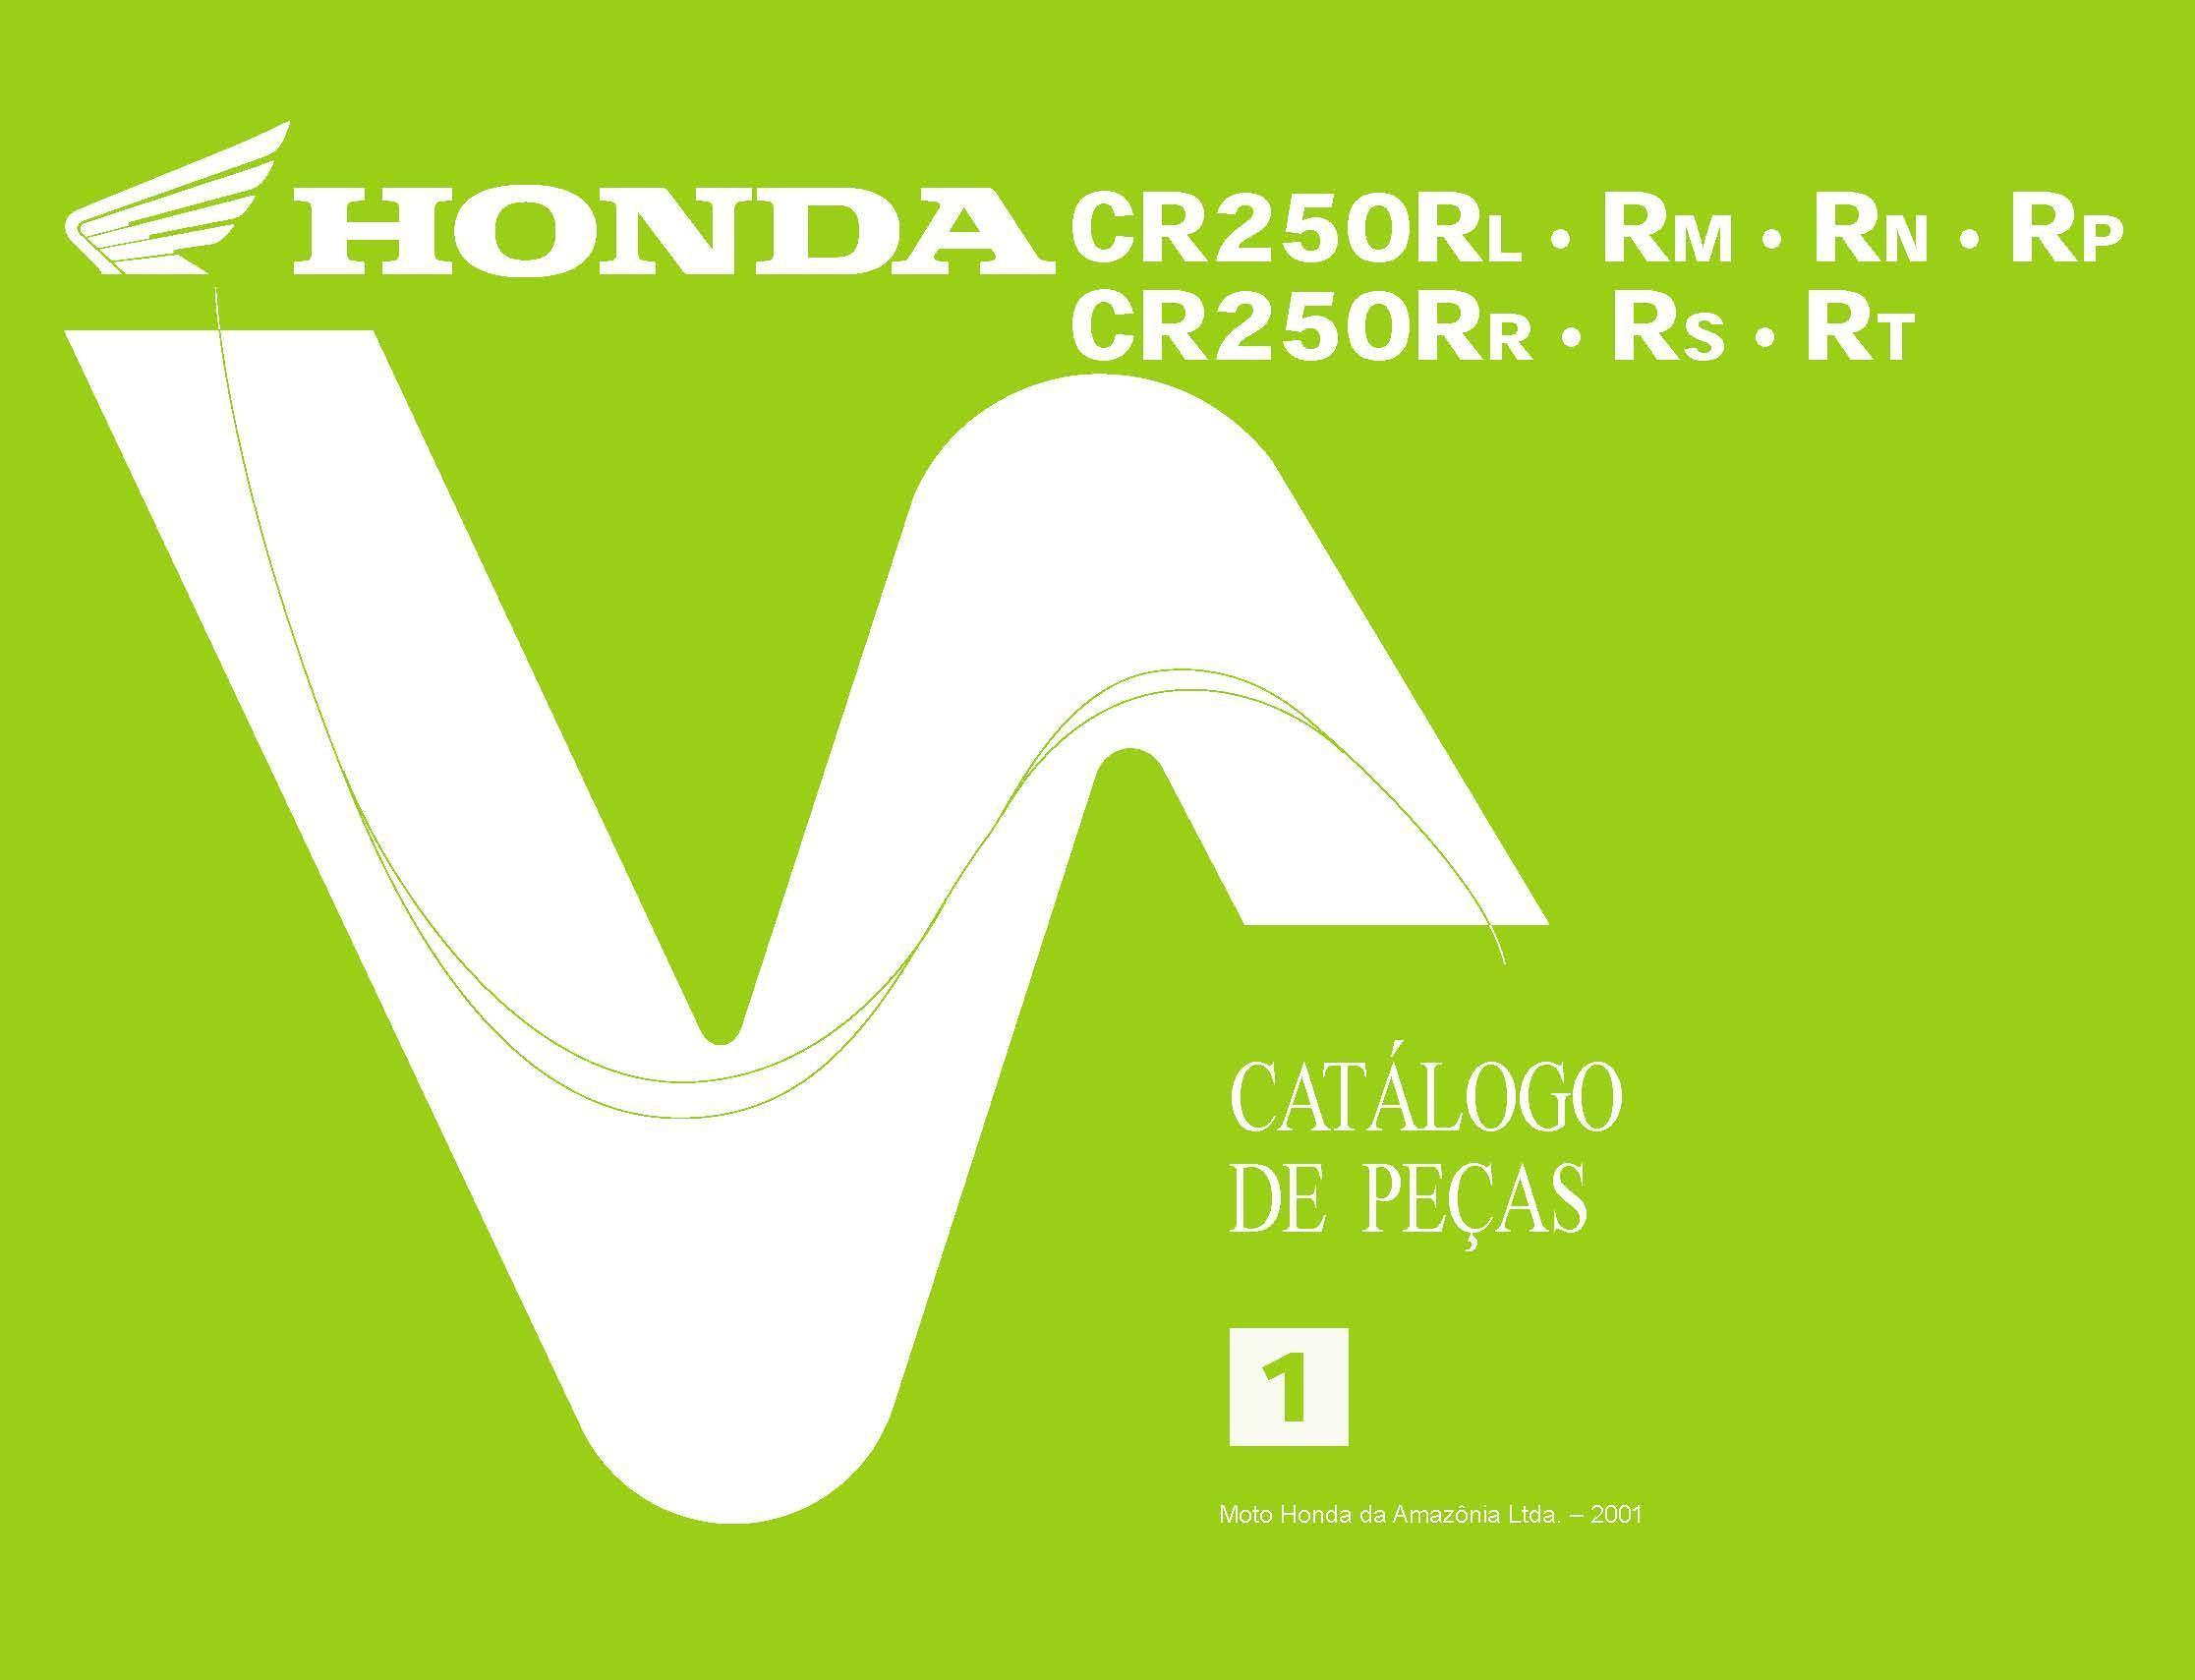 Partslist for Honda CR250RM (2001)